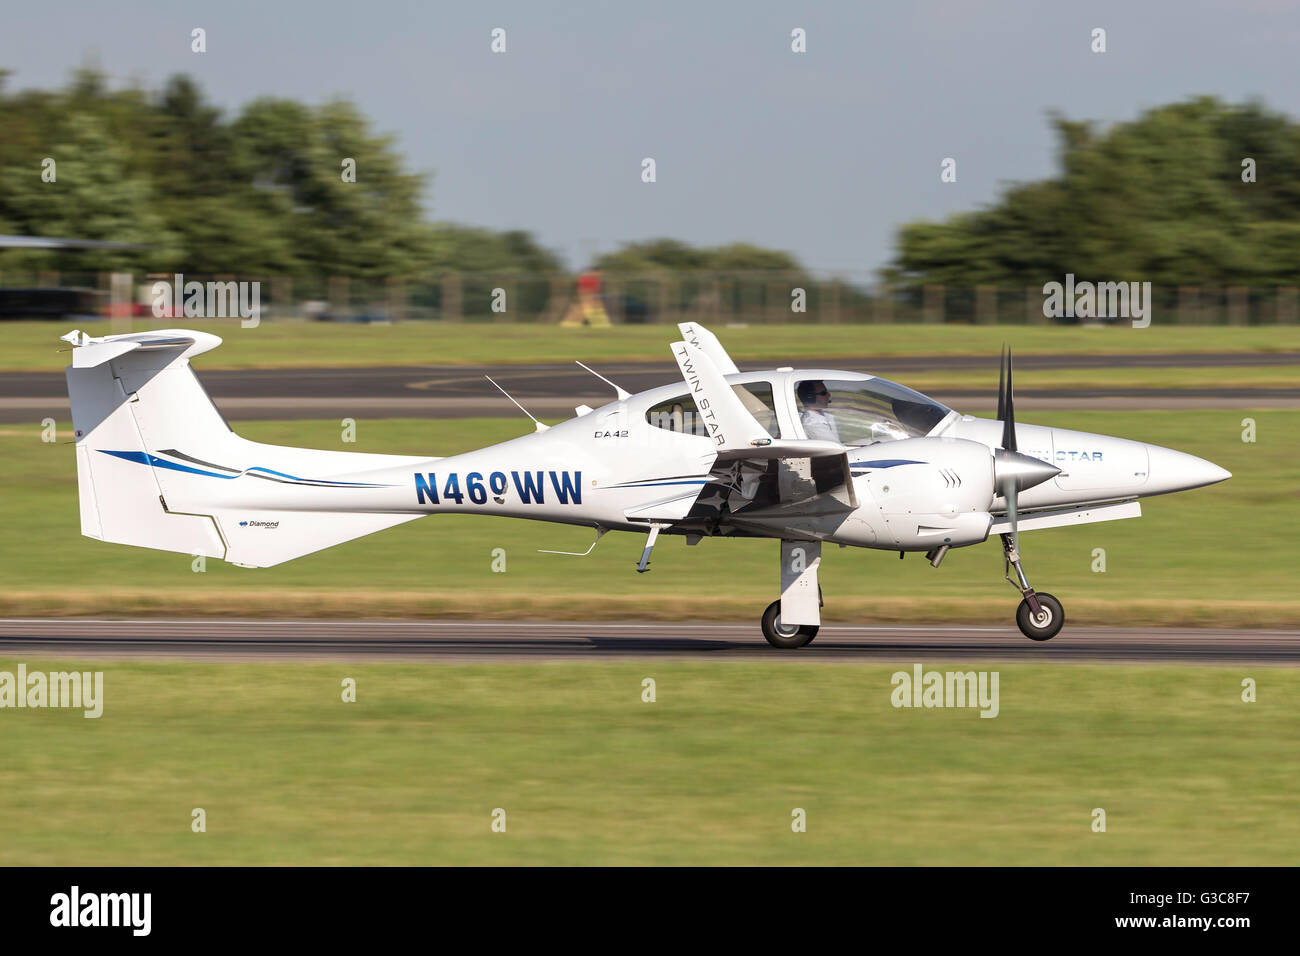 Diamond DA-42 Twin Star twin engine light aircraft N469WW - Stock Image